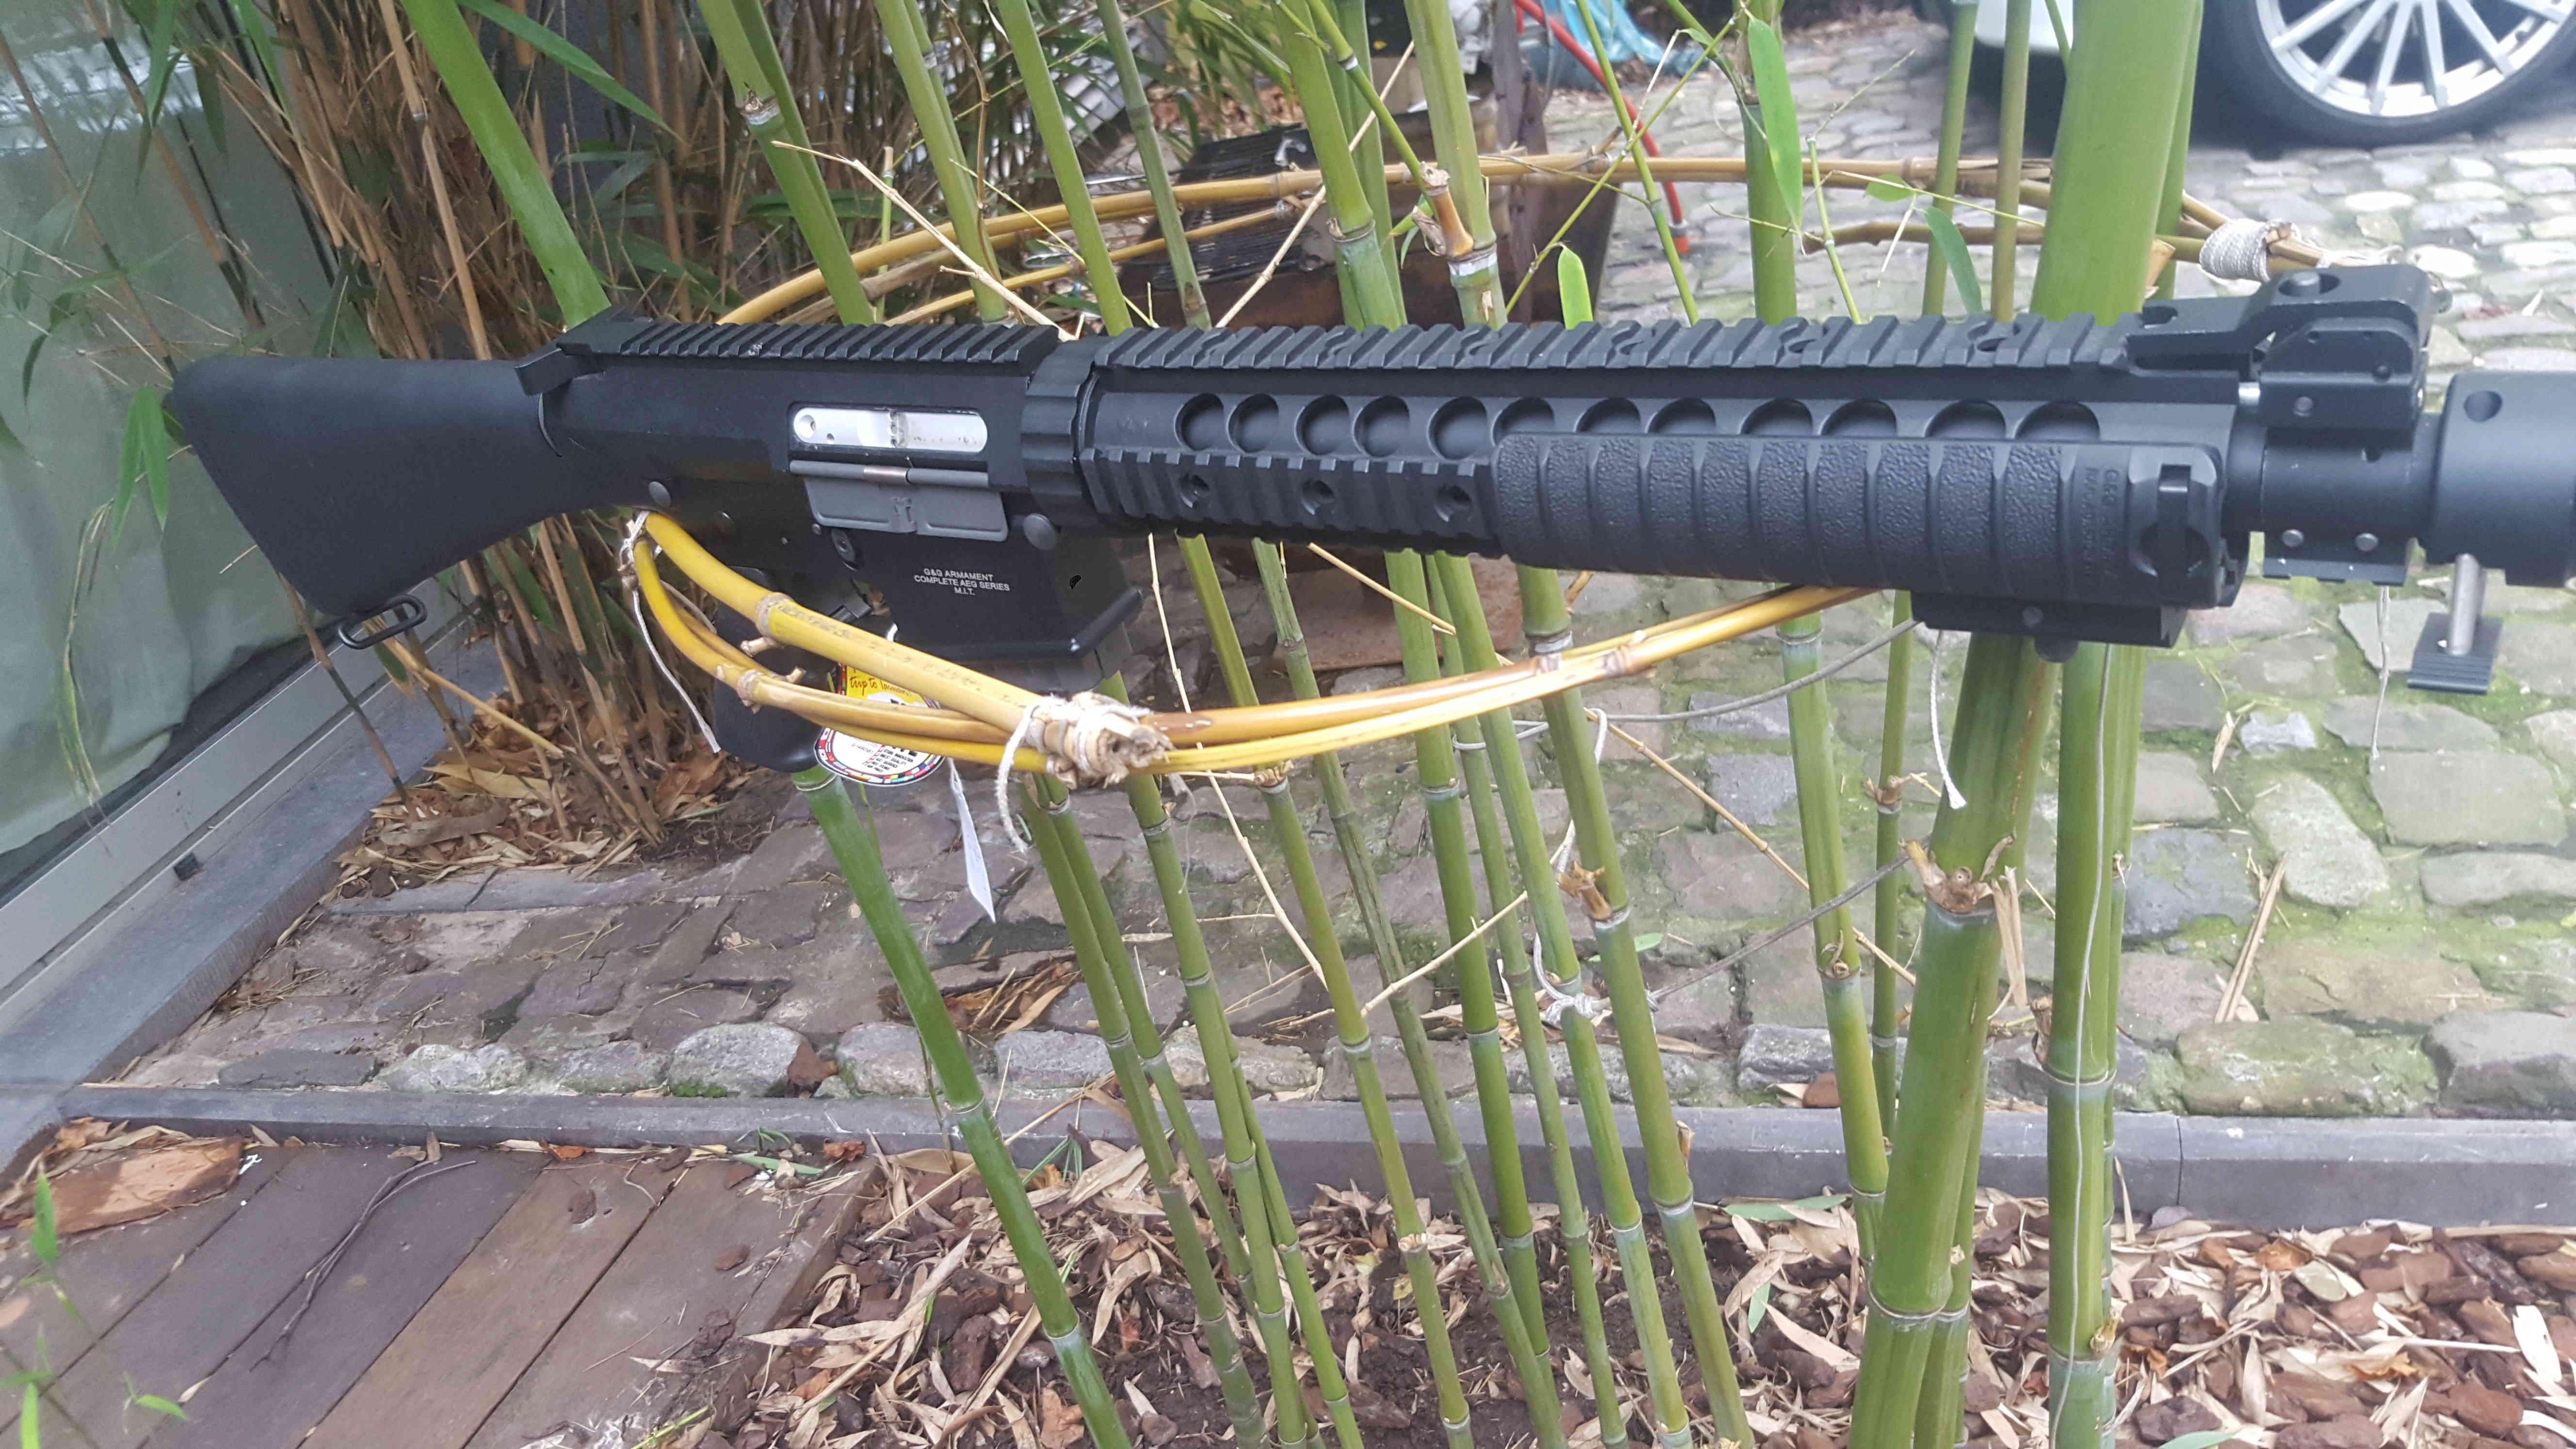 SR25 G&G - SCORPIO EVO HPA - M24 FULL MODIFY Gr25-210